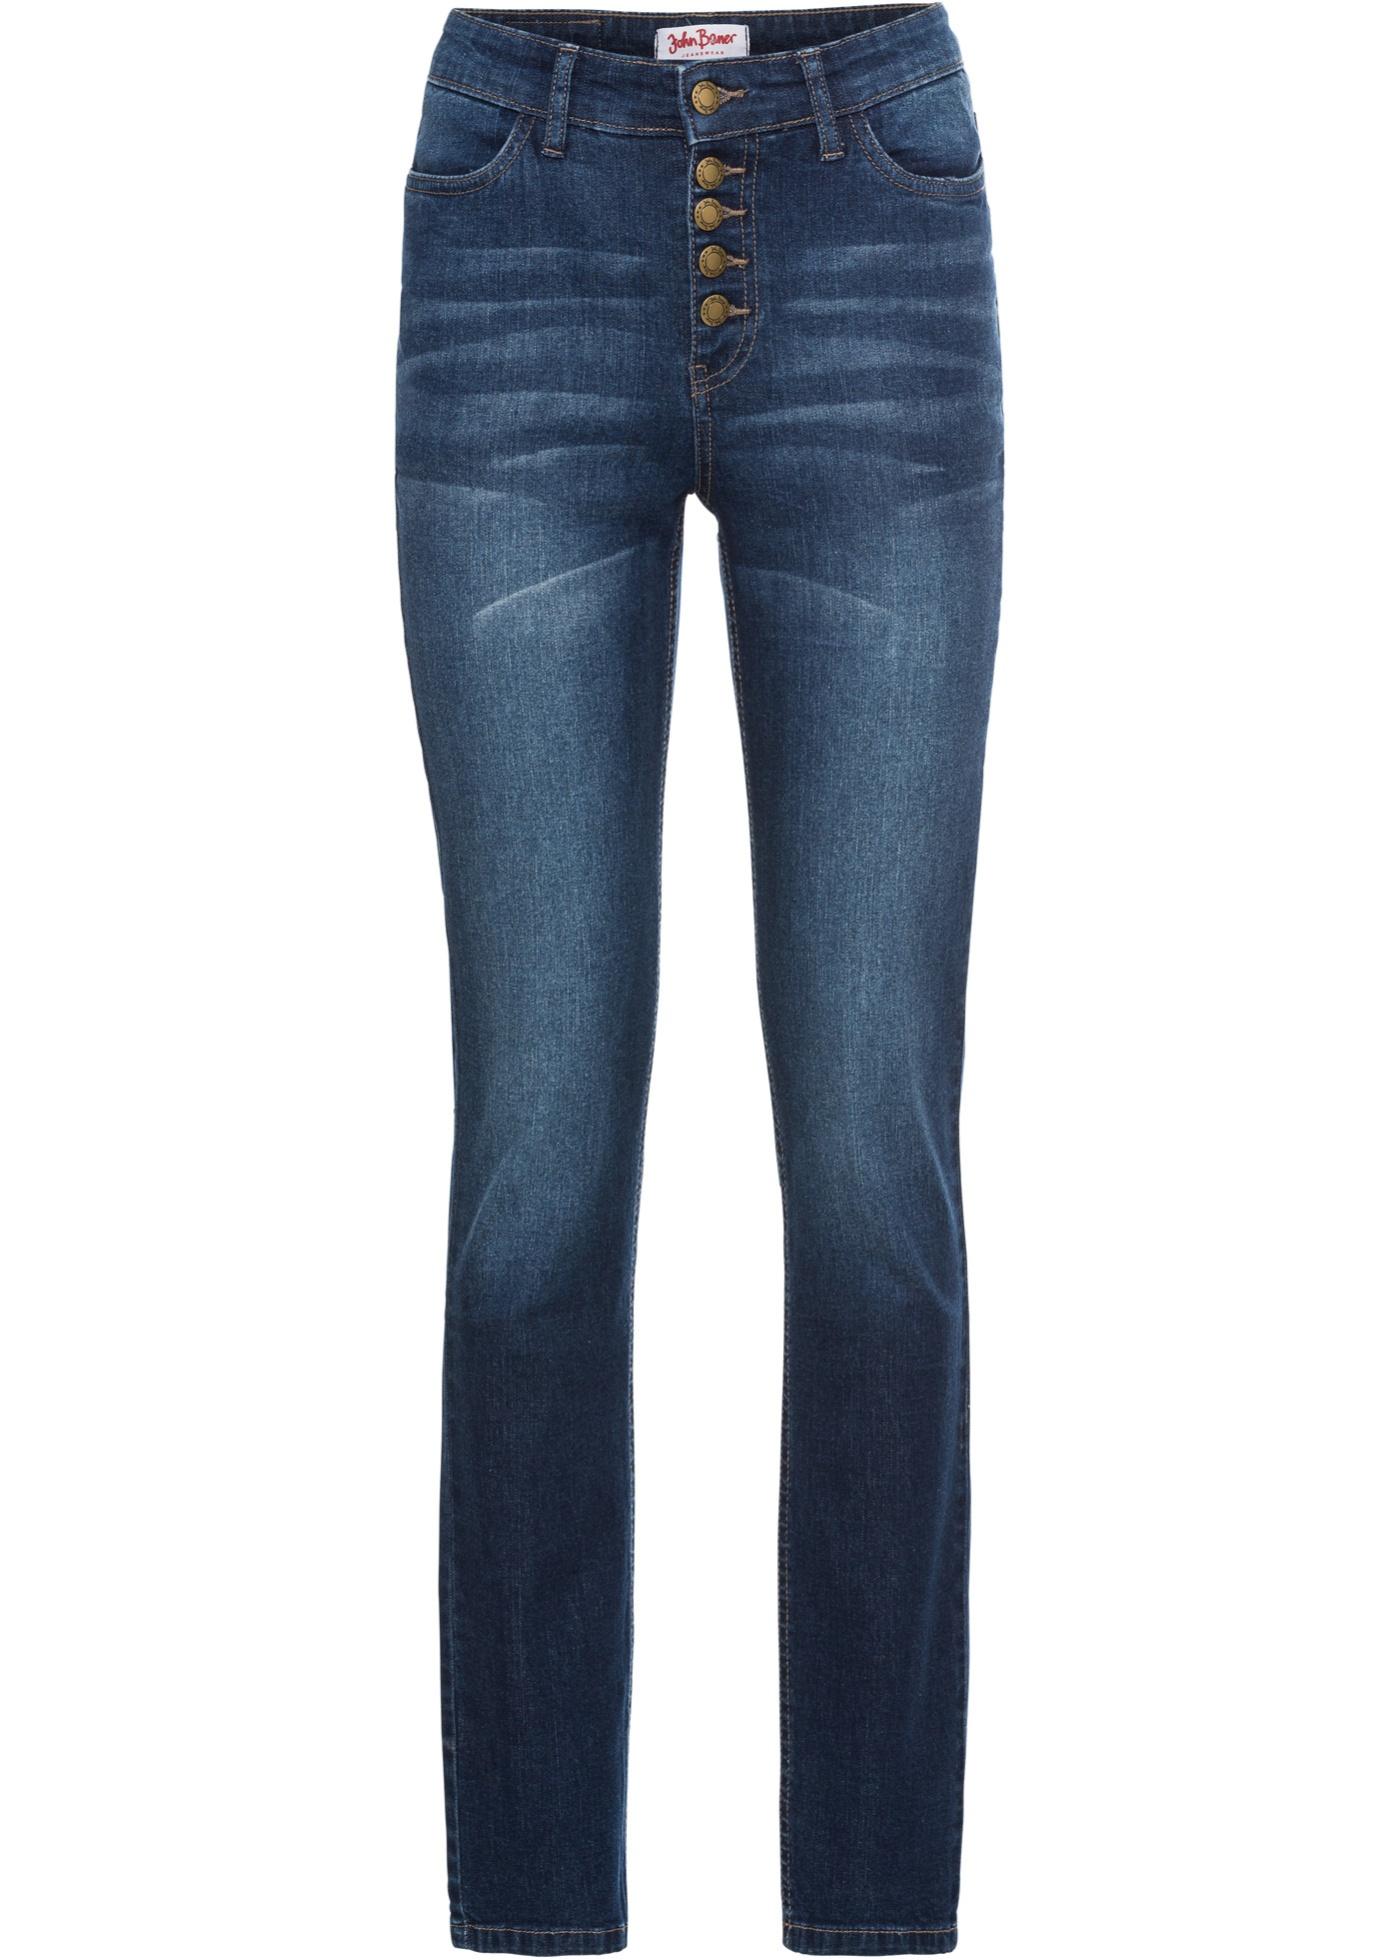 Bonprix SE - Mjuka jeans, smal passform 299.00